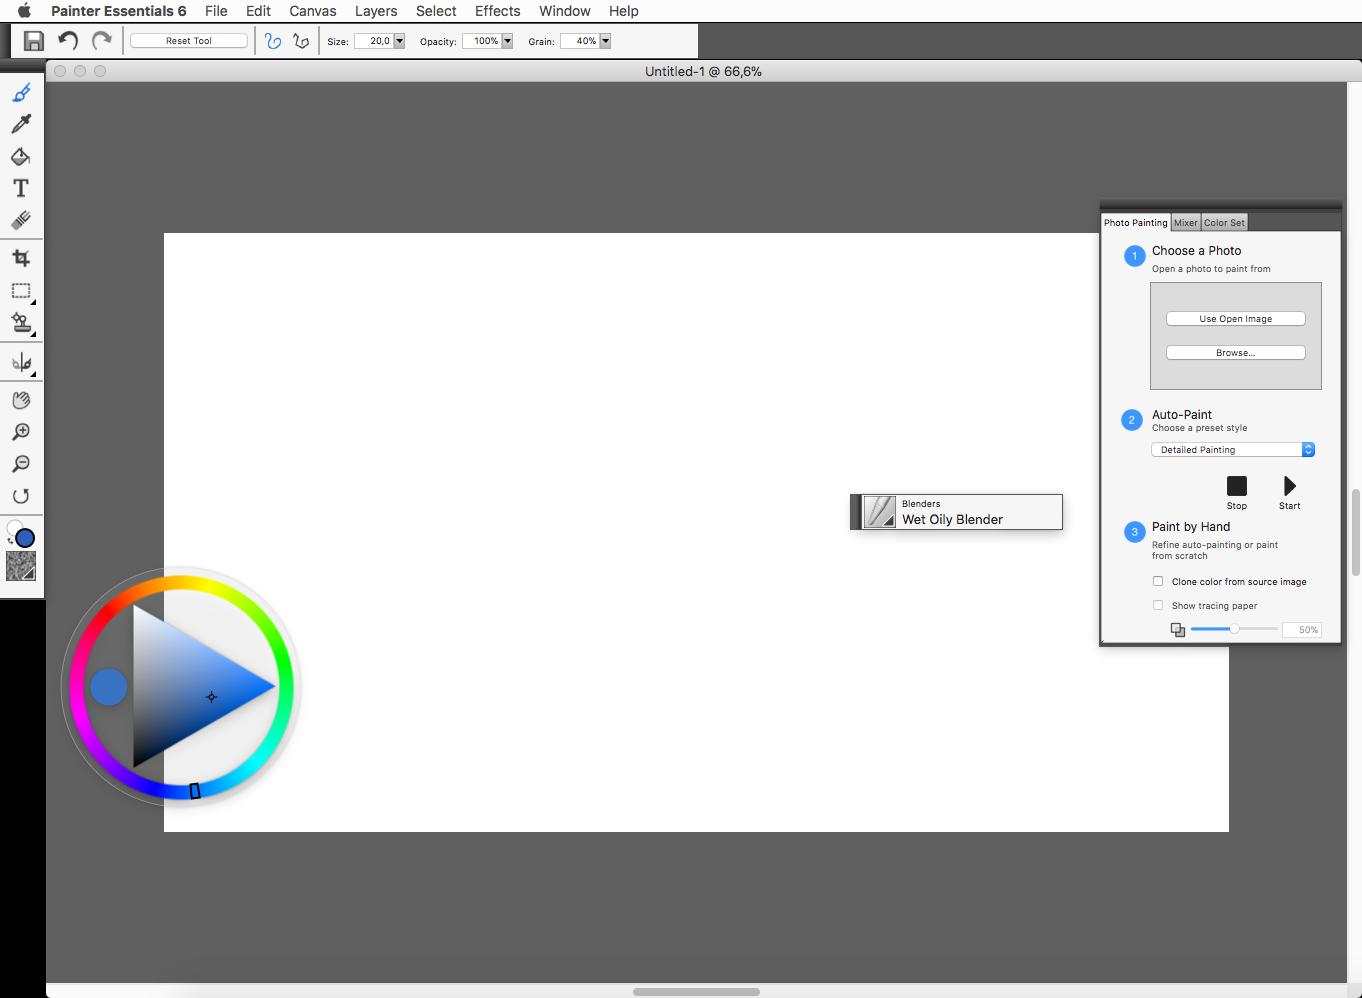 [MAC] Corel Painter Essentials 6.1.0.238 MacOSX - ENG